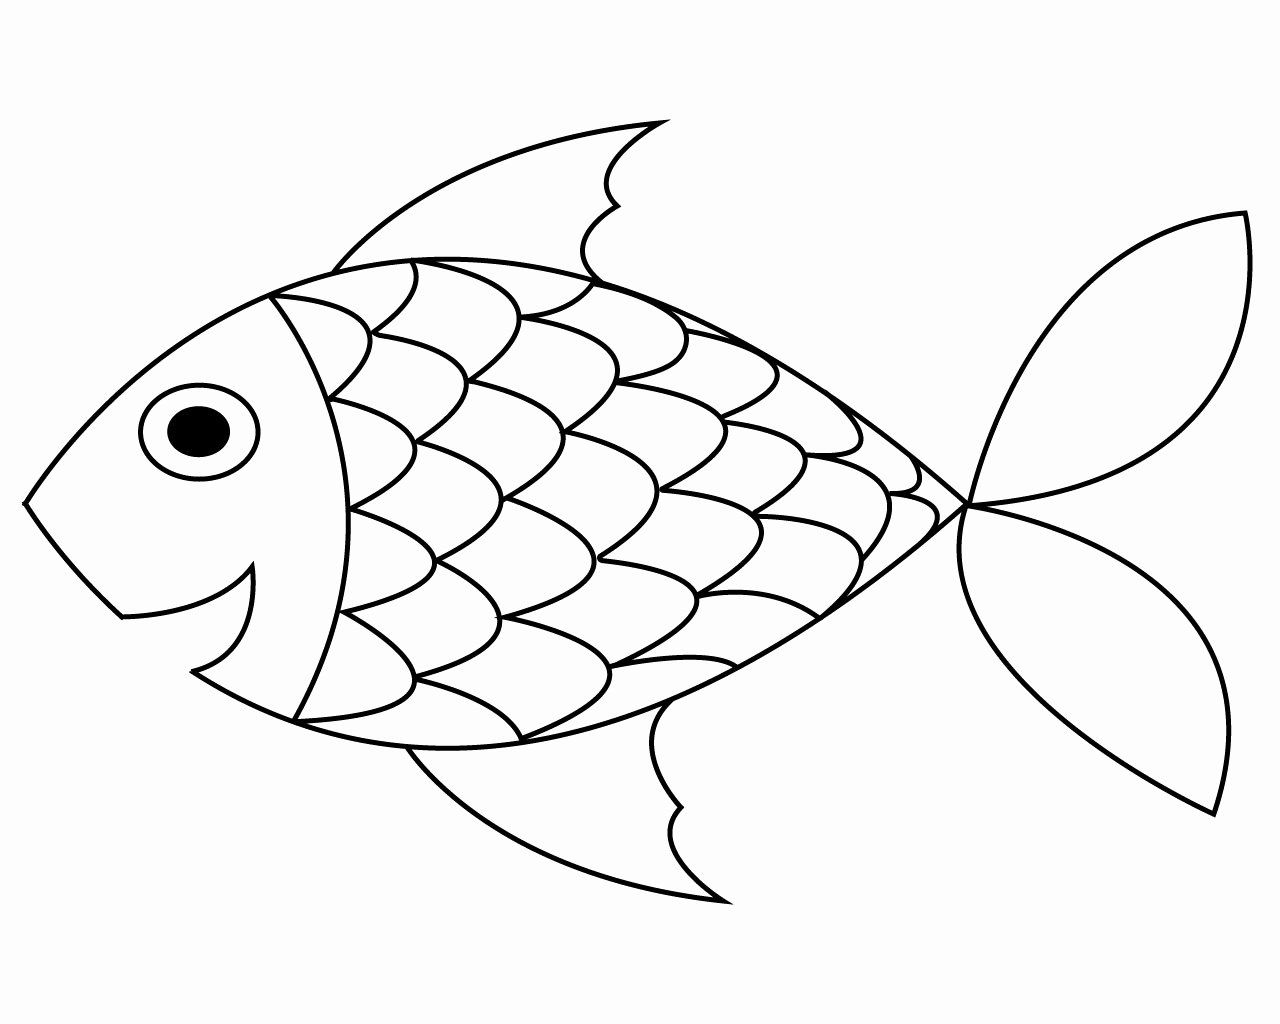 The Rainbow Fish Coloring Template Sb1732 1754 X 1240 6374 Kb Rainbow Fish Template Rainbow Fish Coloring Page Rainbow Fish Book